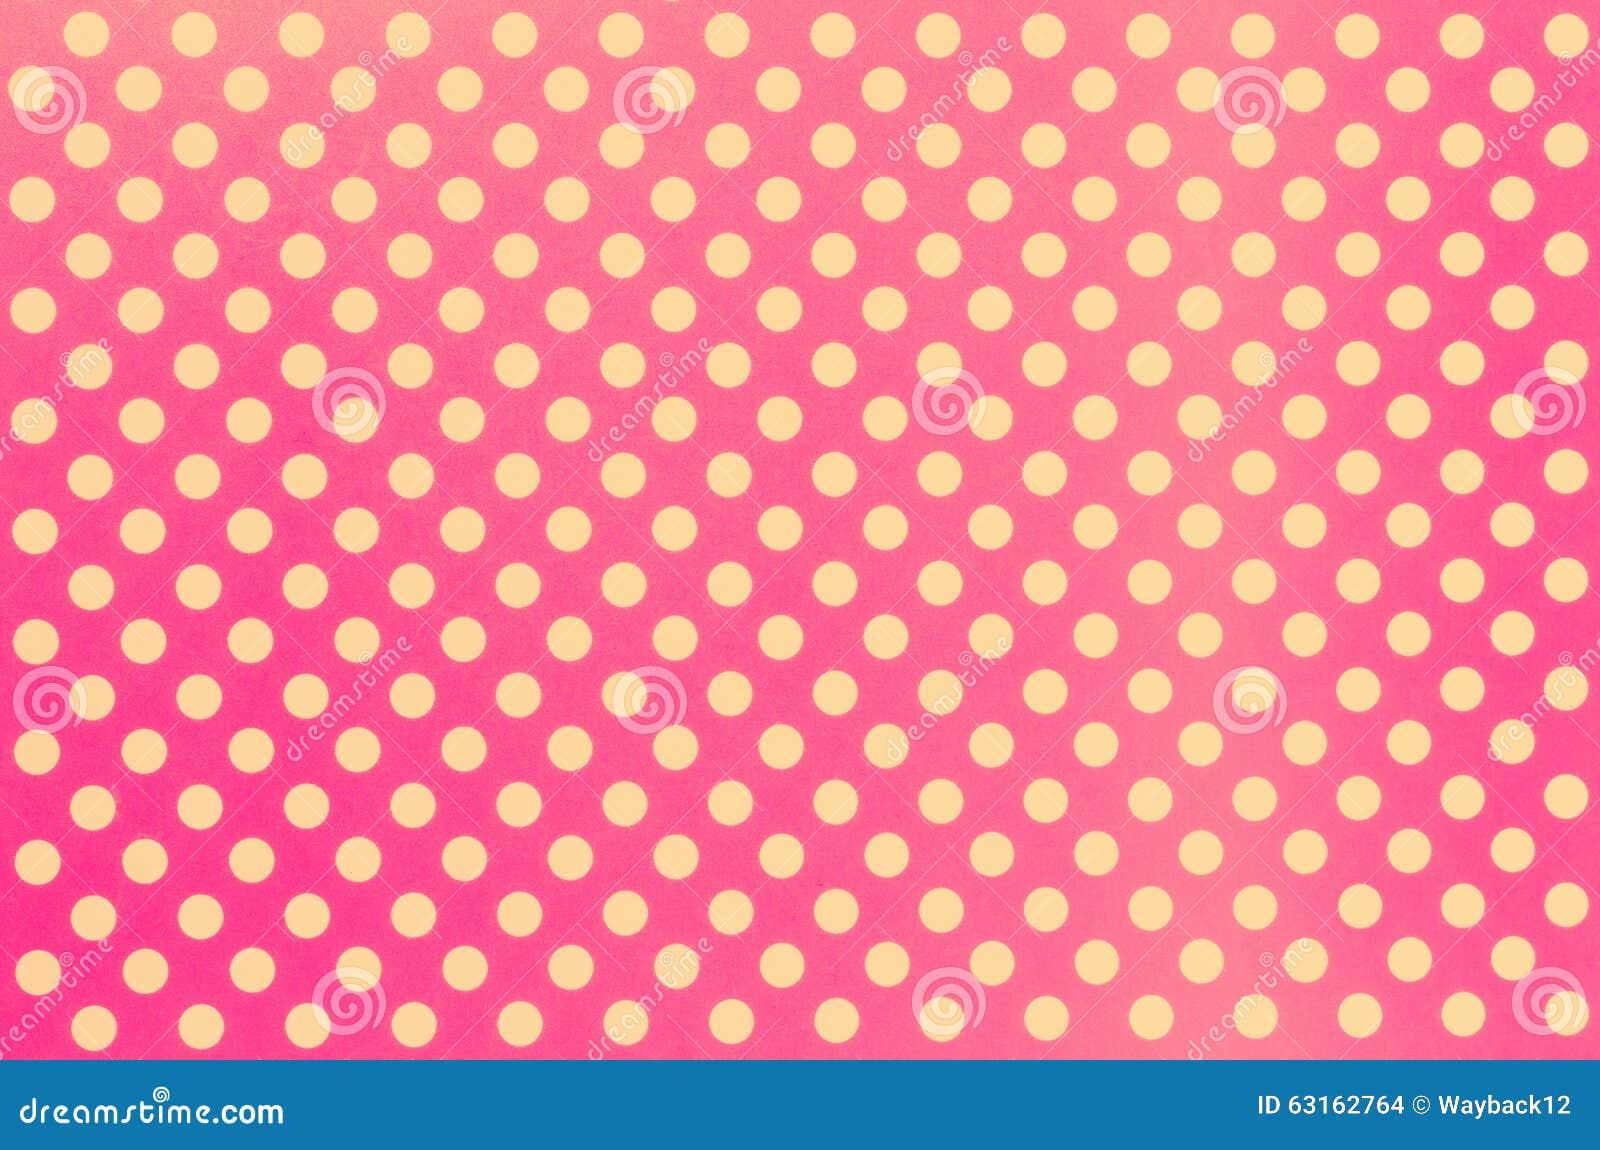 vintage polka dot background stock photo image 63162764